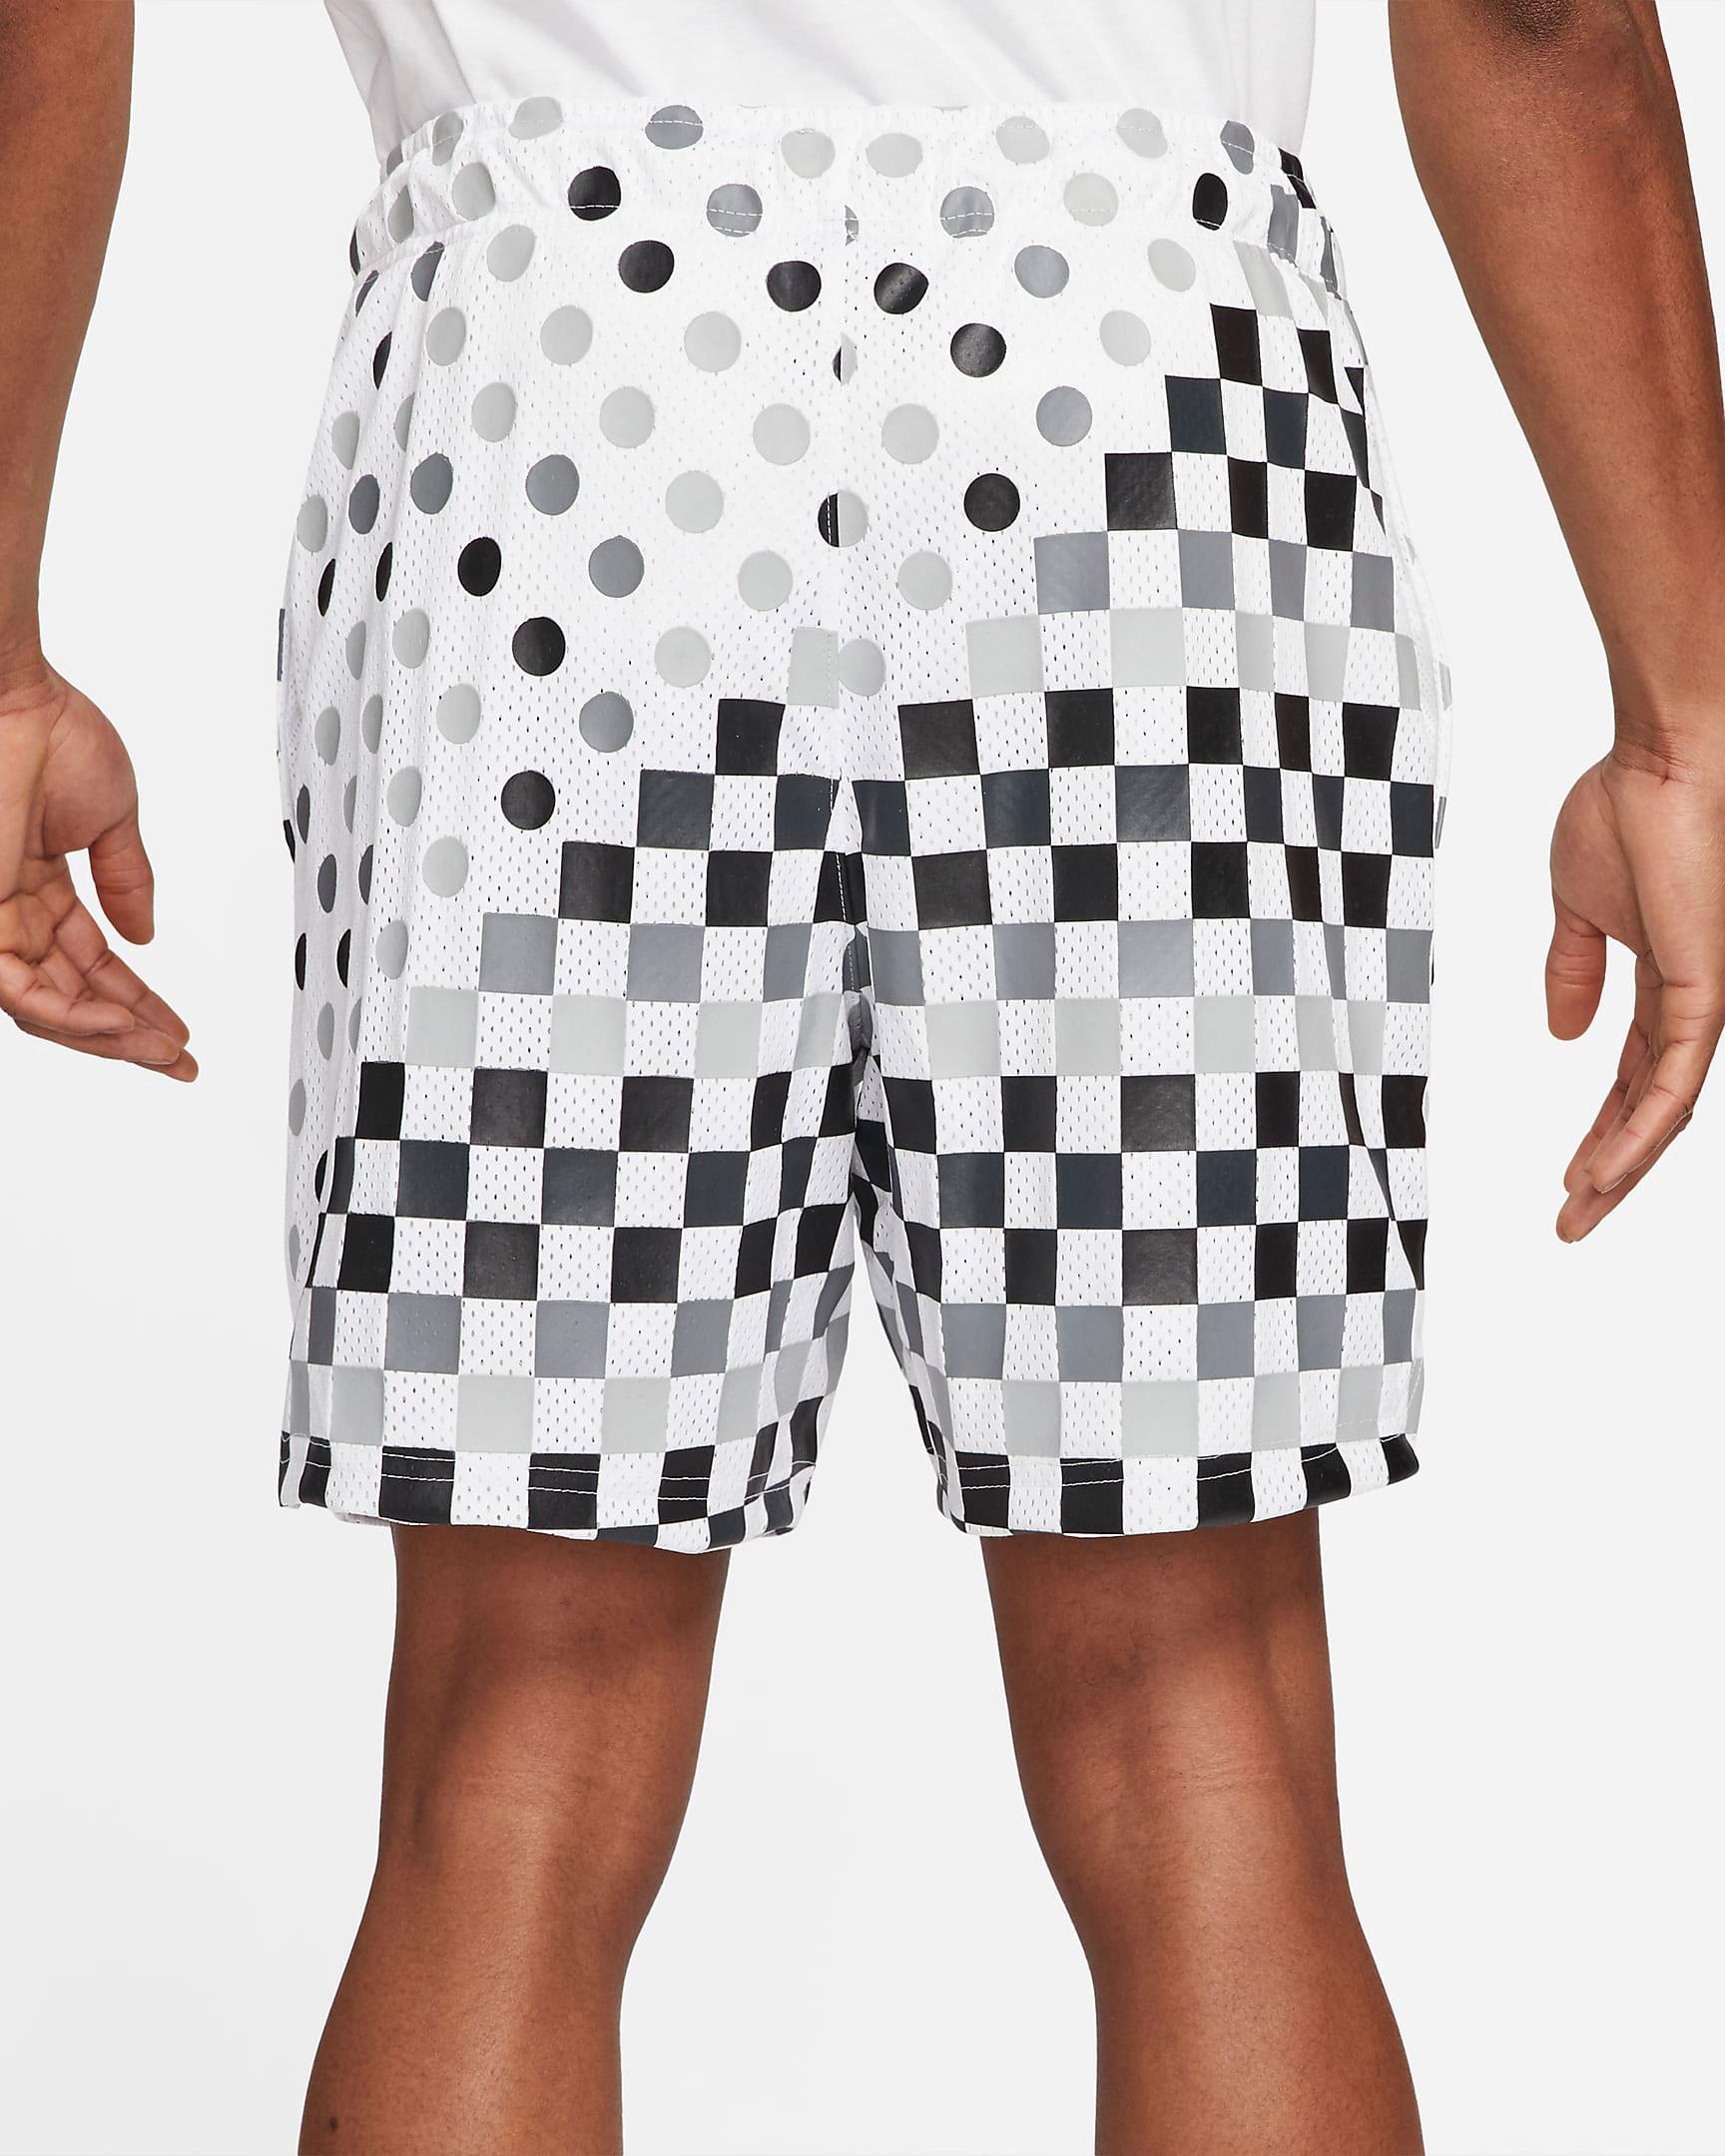 where-to-buy-air-jordan-3-cool-grey-2021-shorts-3